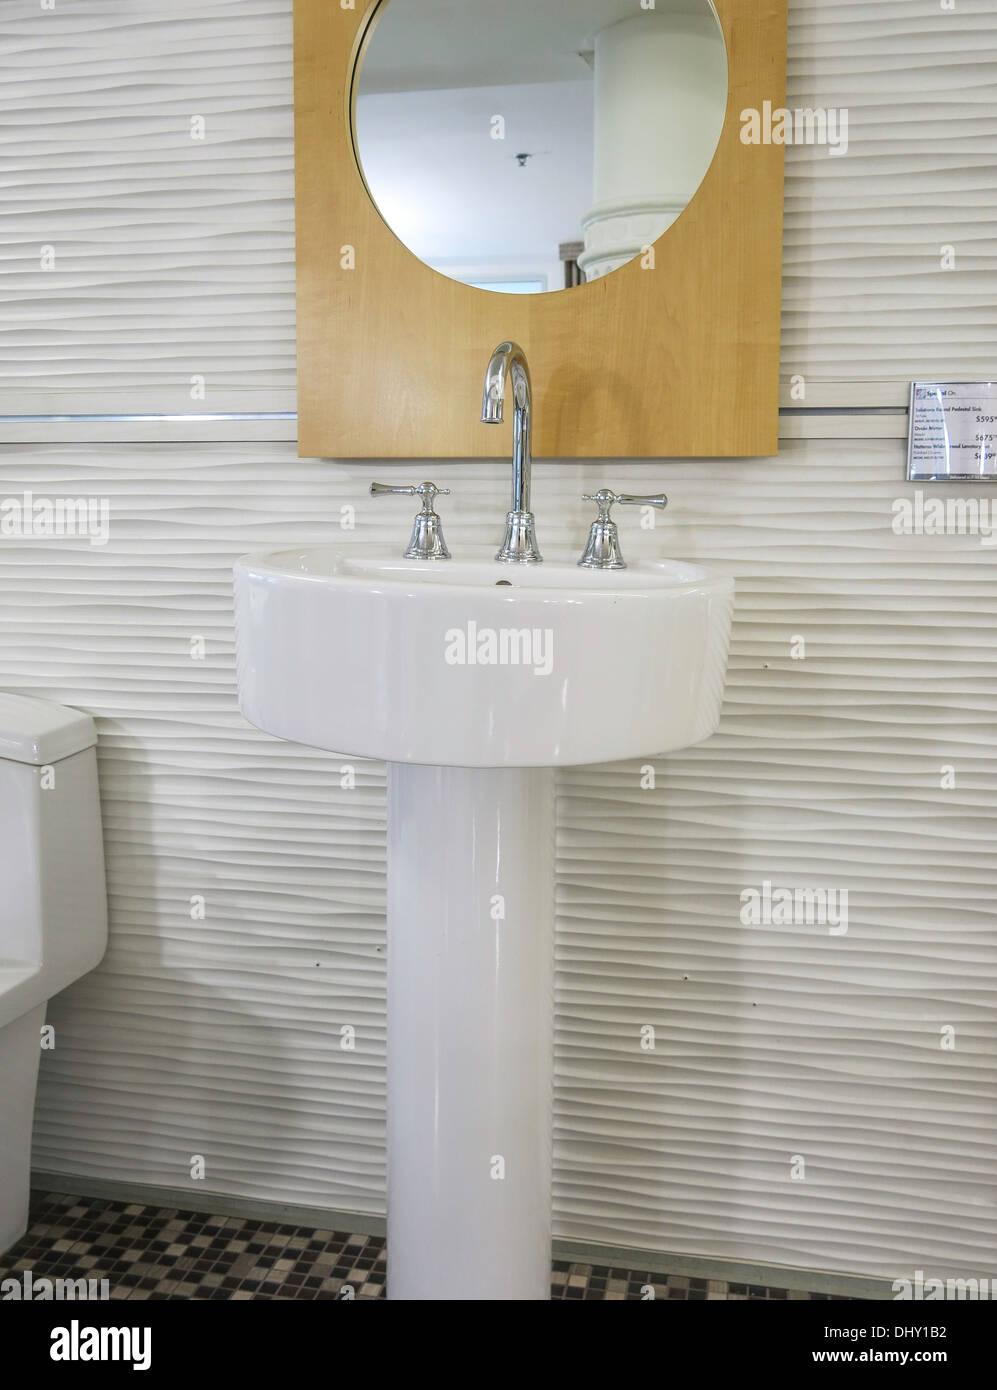 Contemporary Bathroom Store Sink Faucet Stock Photos & Contemporary ...